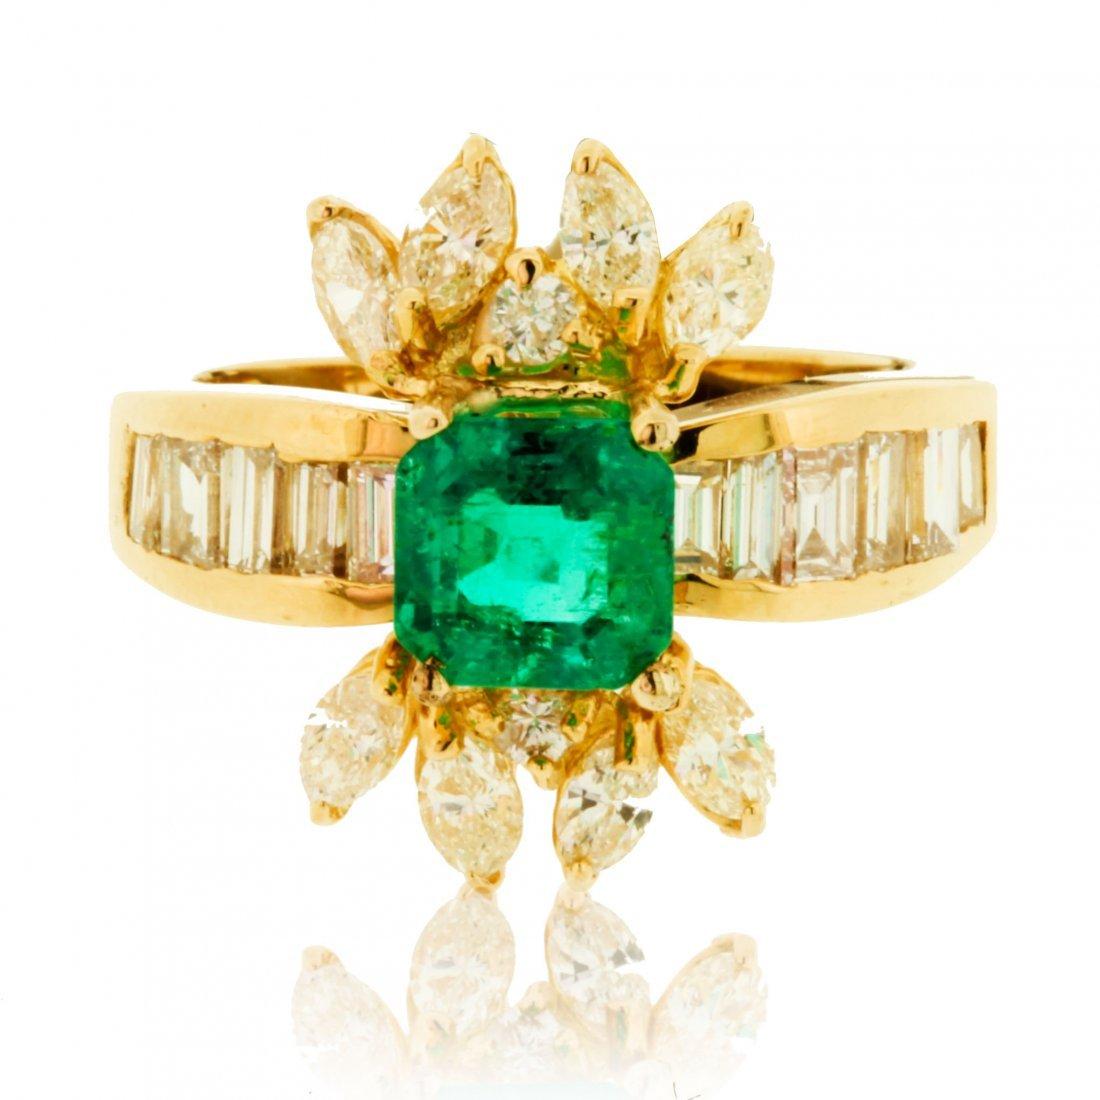 18K YELLOW EMERALD / DIAMOND RING